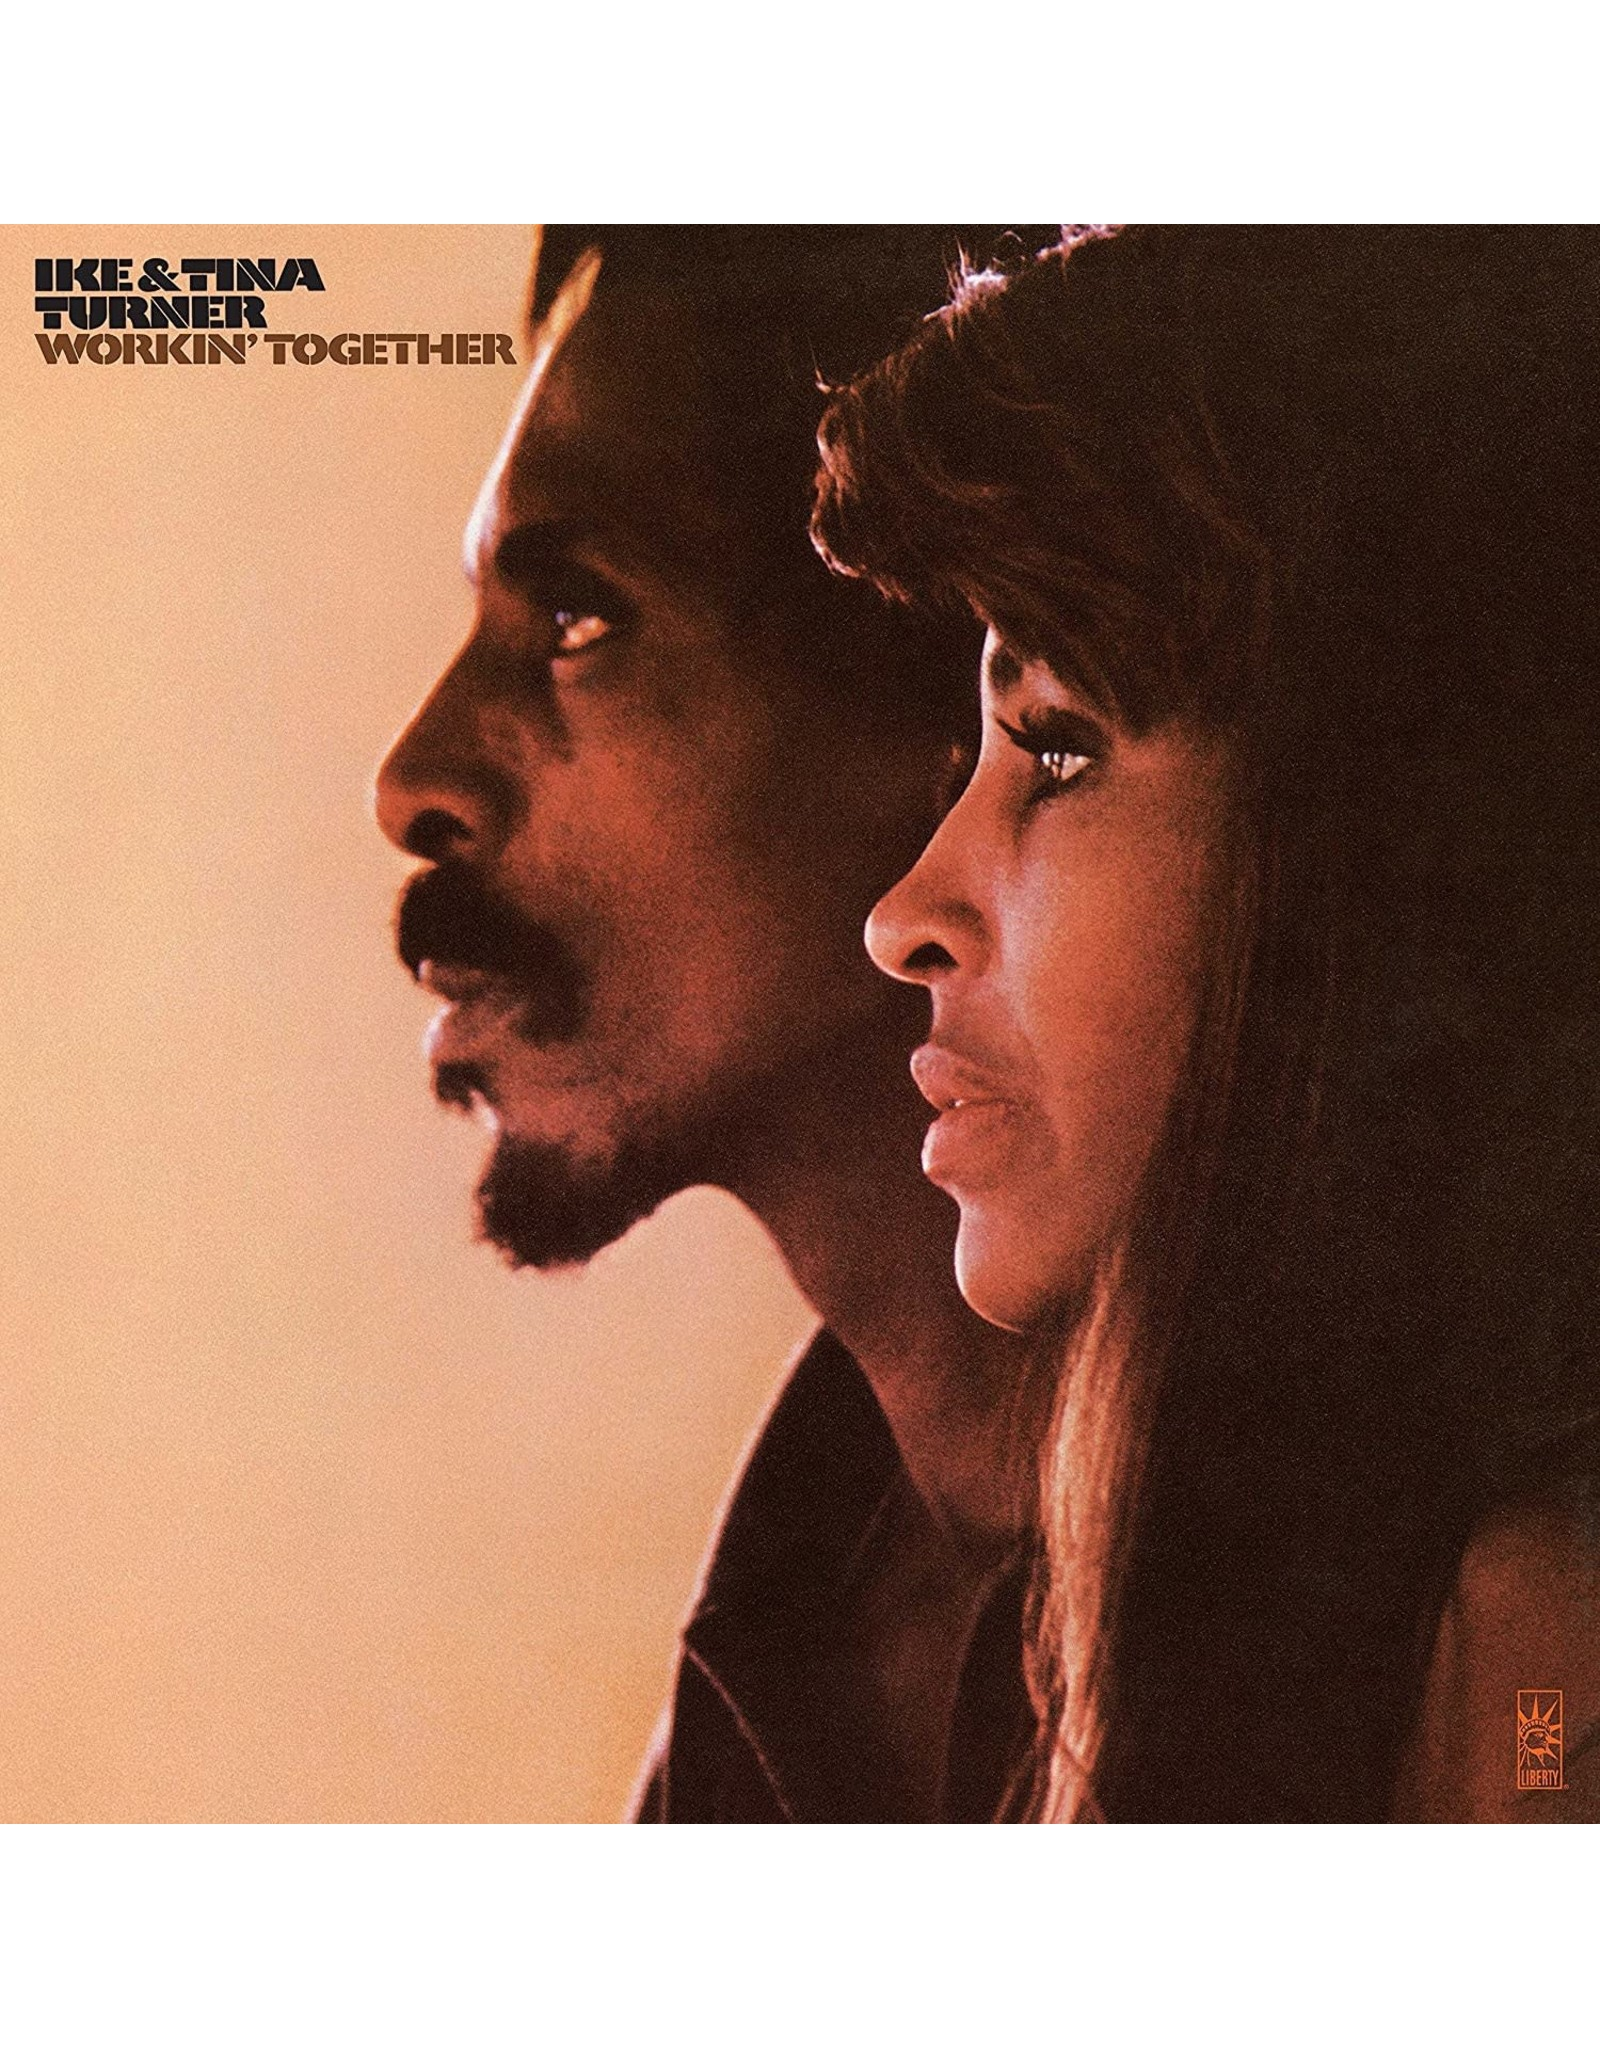 Ike and Tina Turner - Workin' Together (50th Anniversary)